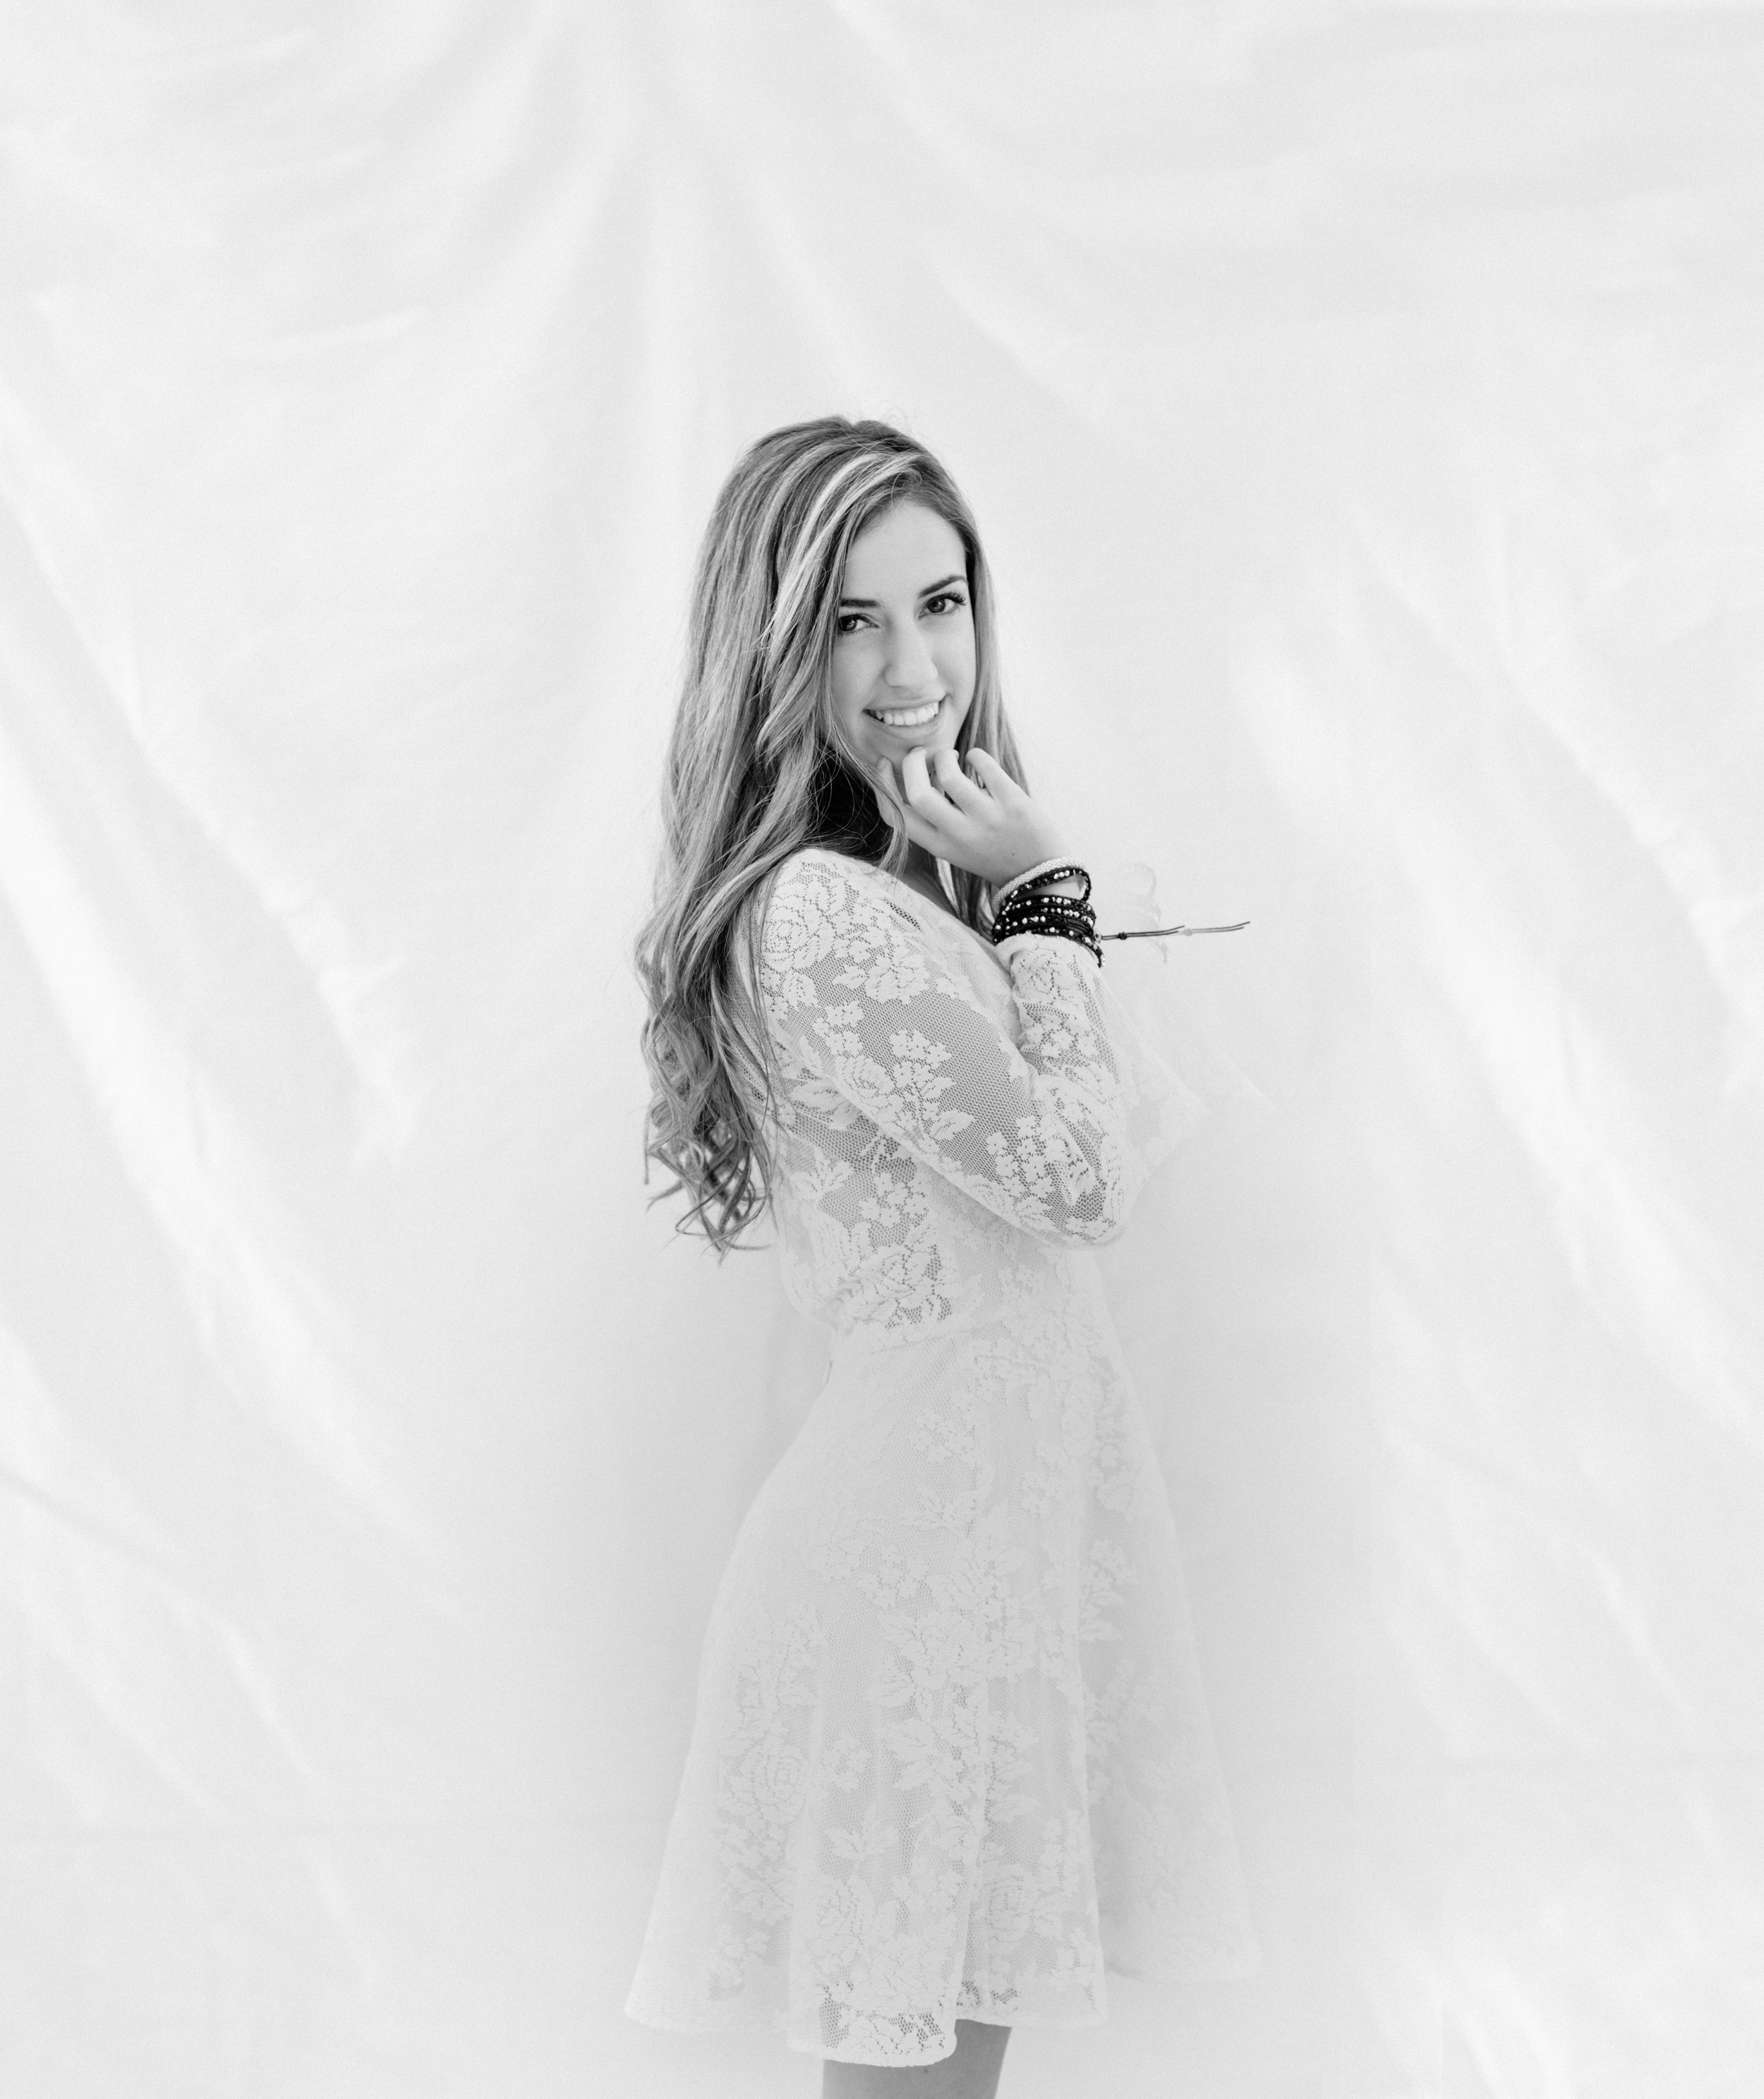 Portraits_2015.10.11_Angello, Bianca_0004_FULL RES.jpg